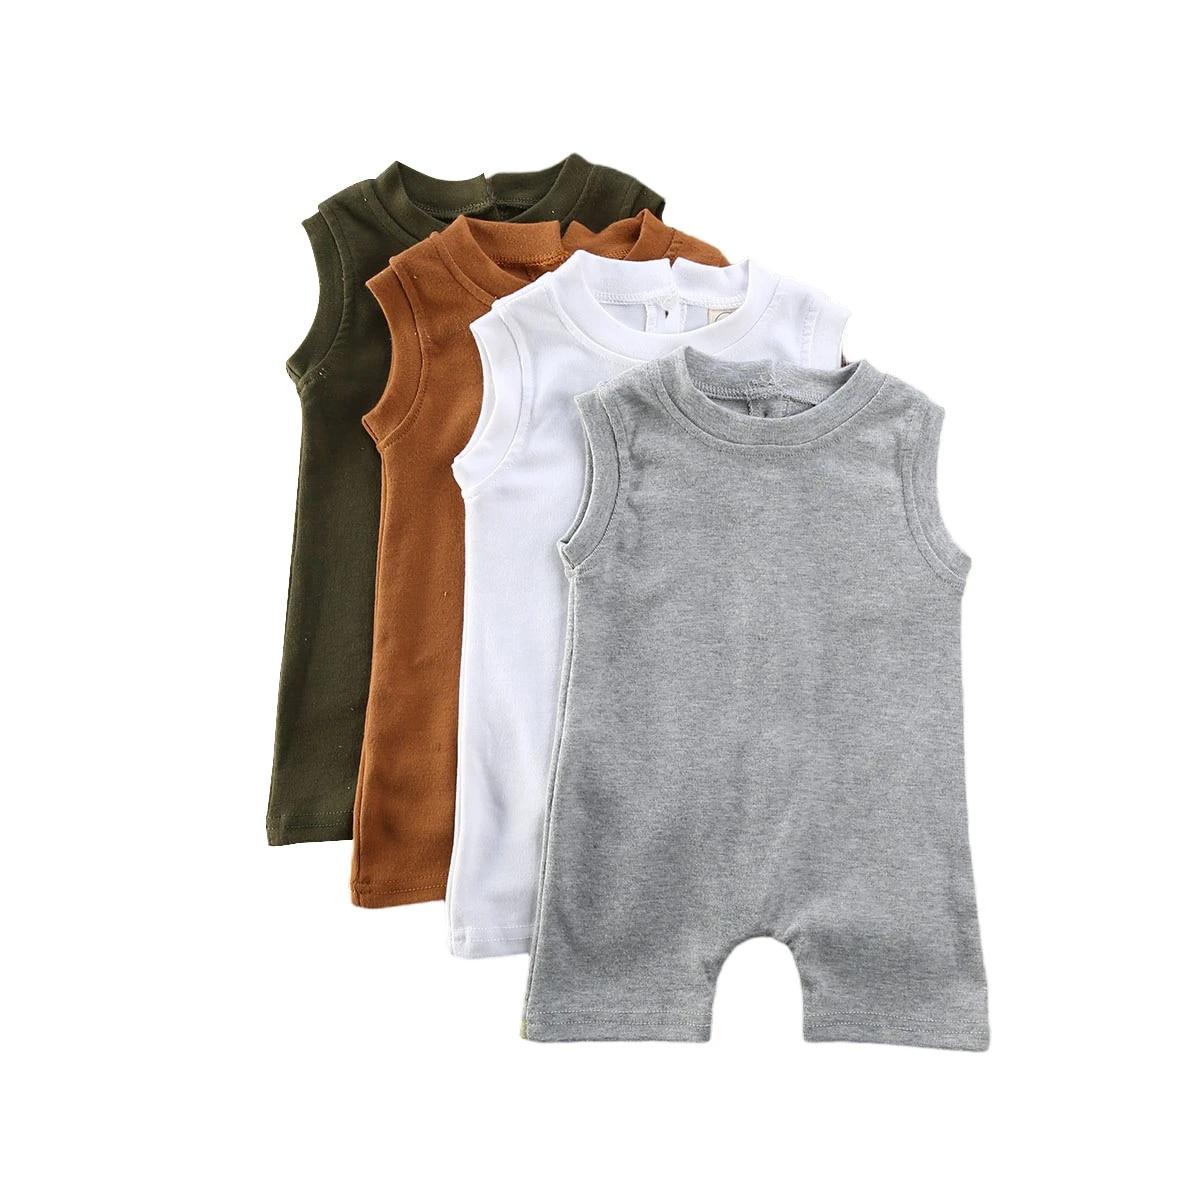 NEW Summer Newborn Toddler Boy Girl Solid Jumpsuit Cotton Romper Bodysuit Outfit